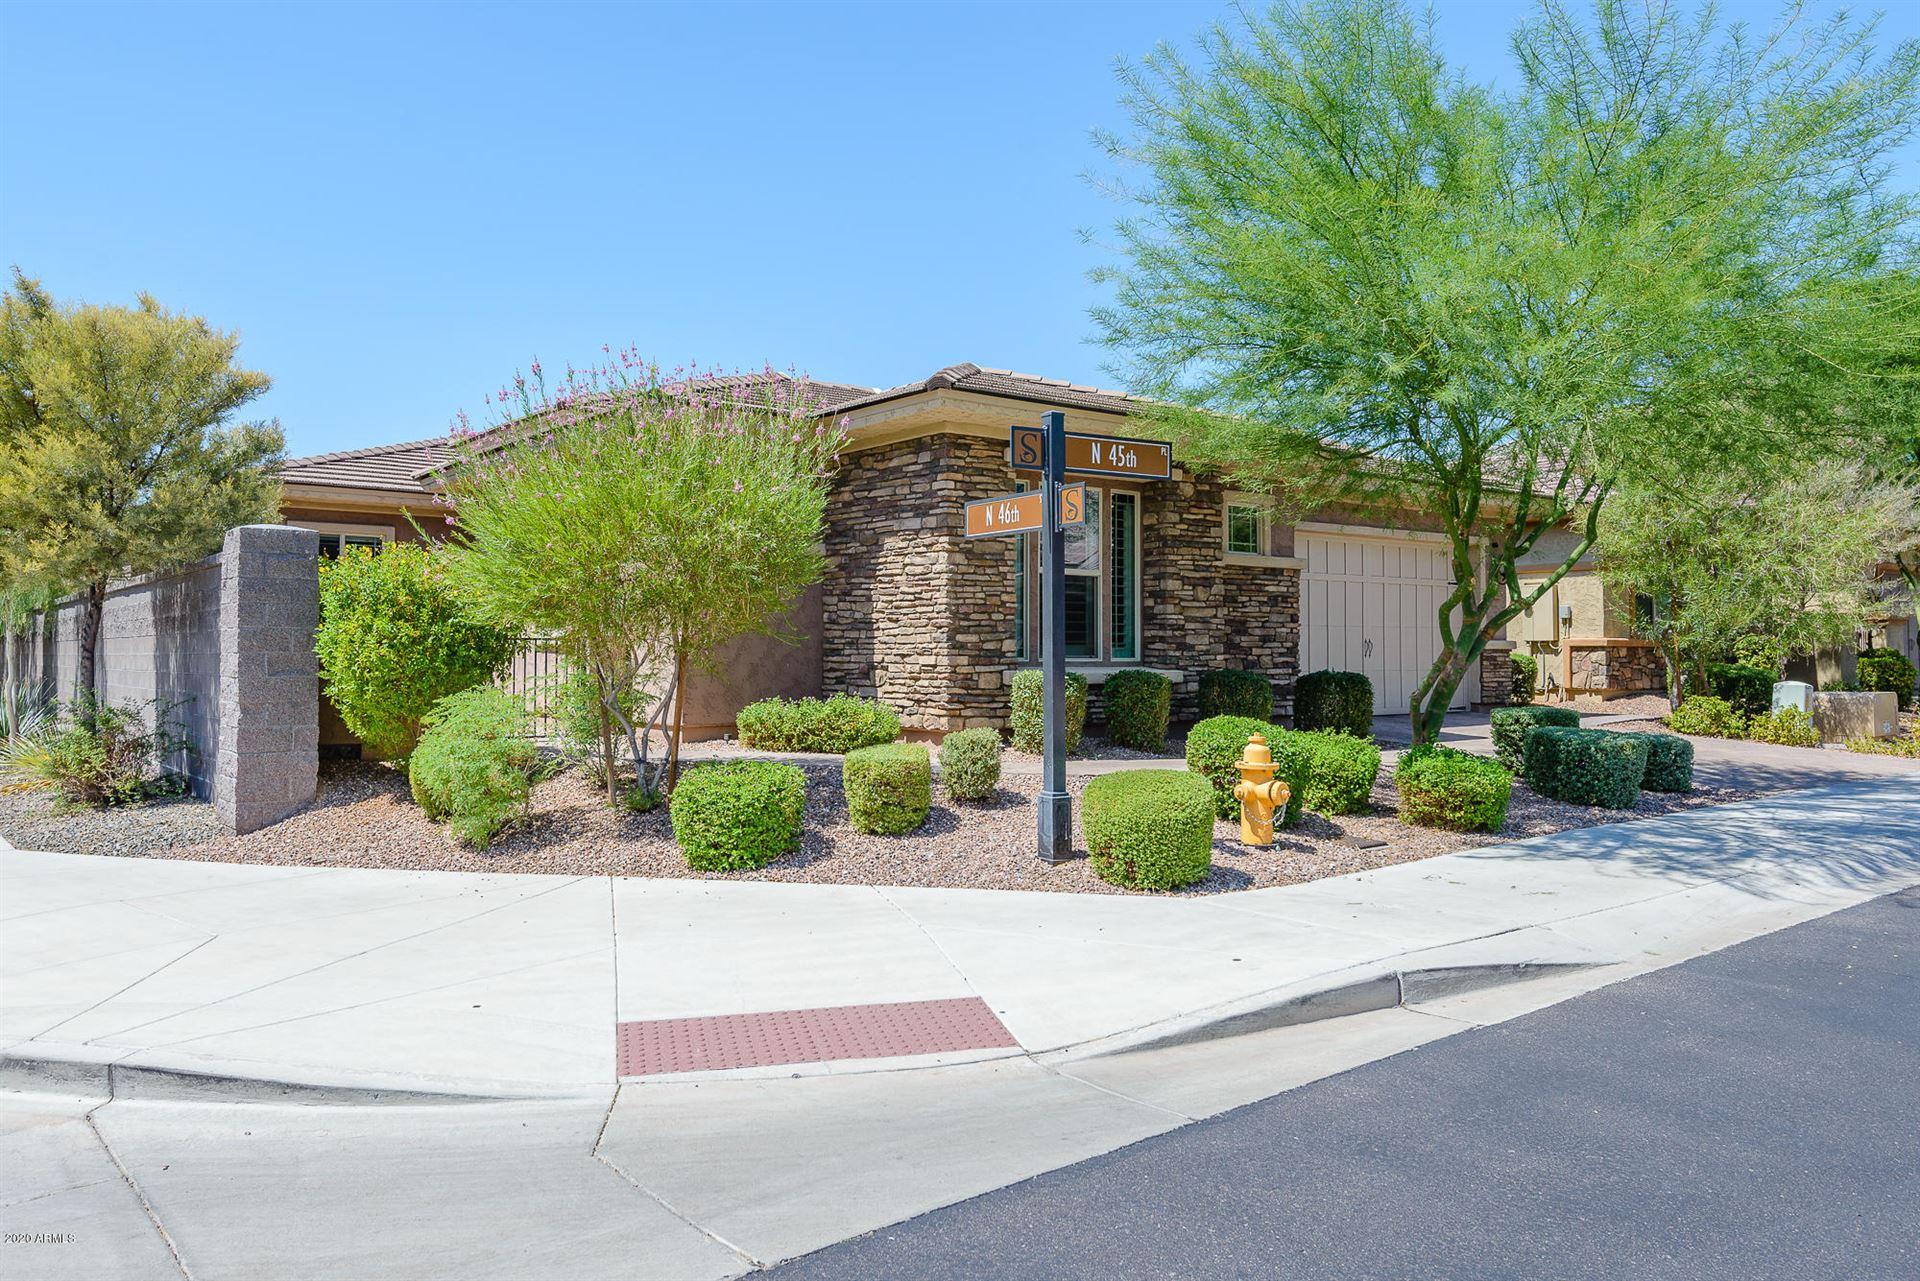 22910 N 45TH Place, Phoenix, AZ 85050 - MLS#: 6128185